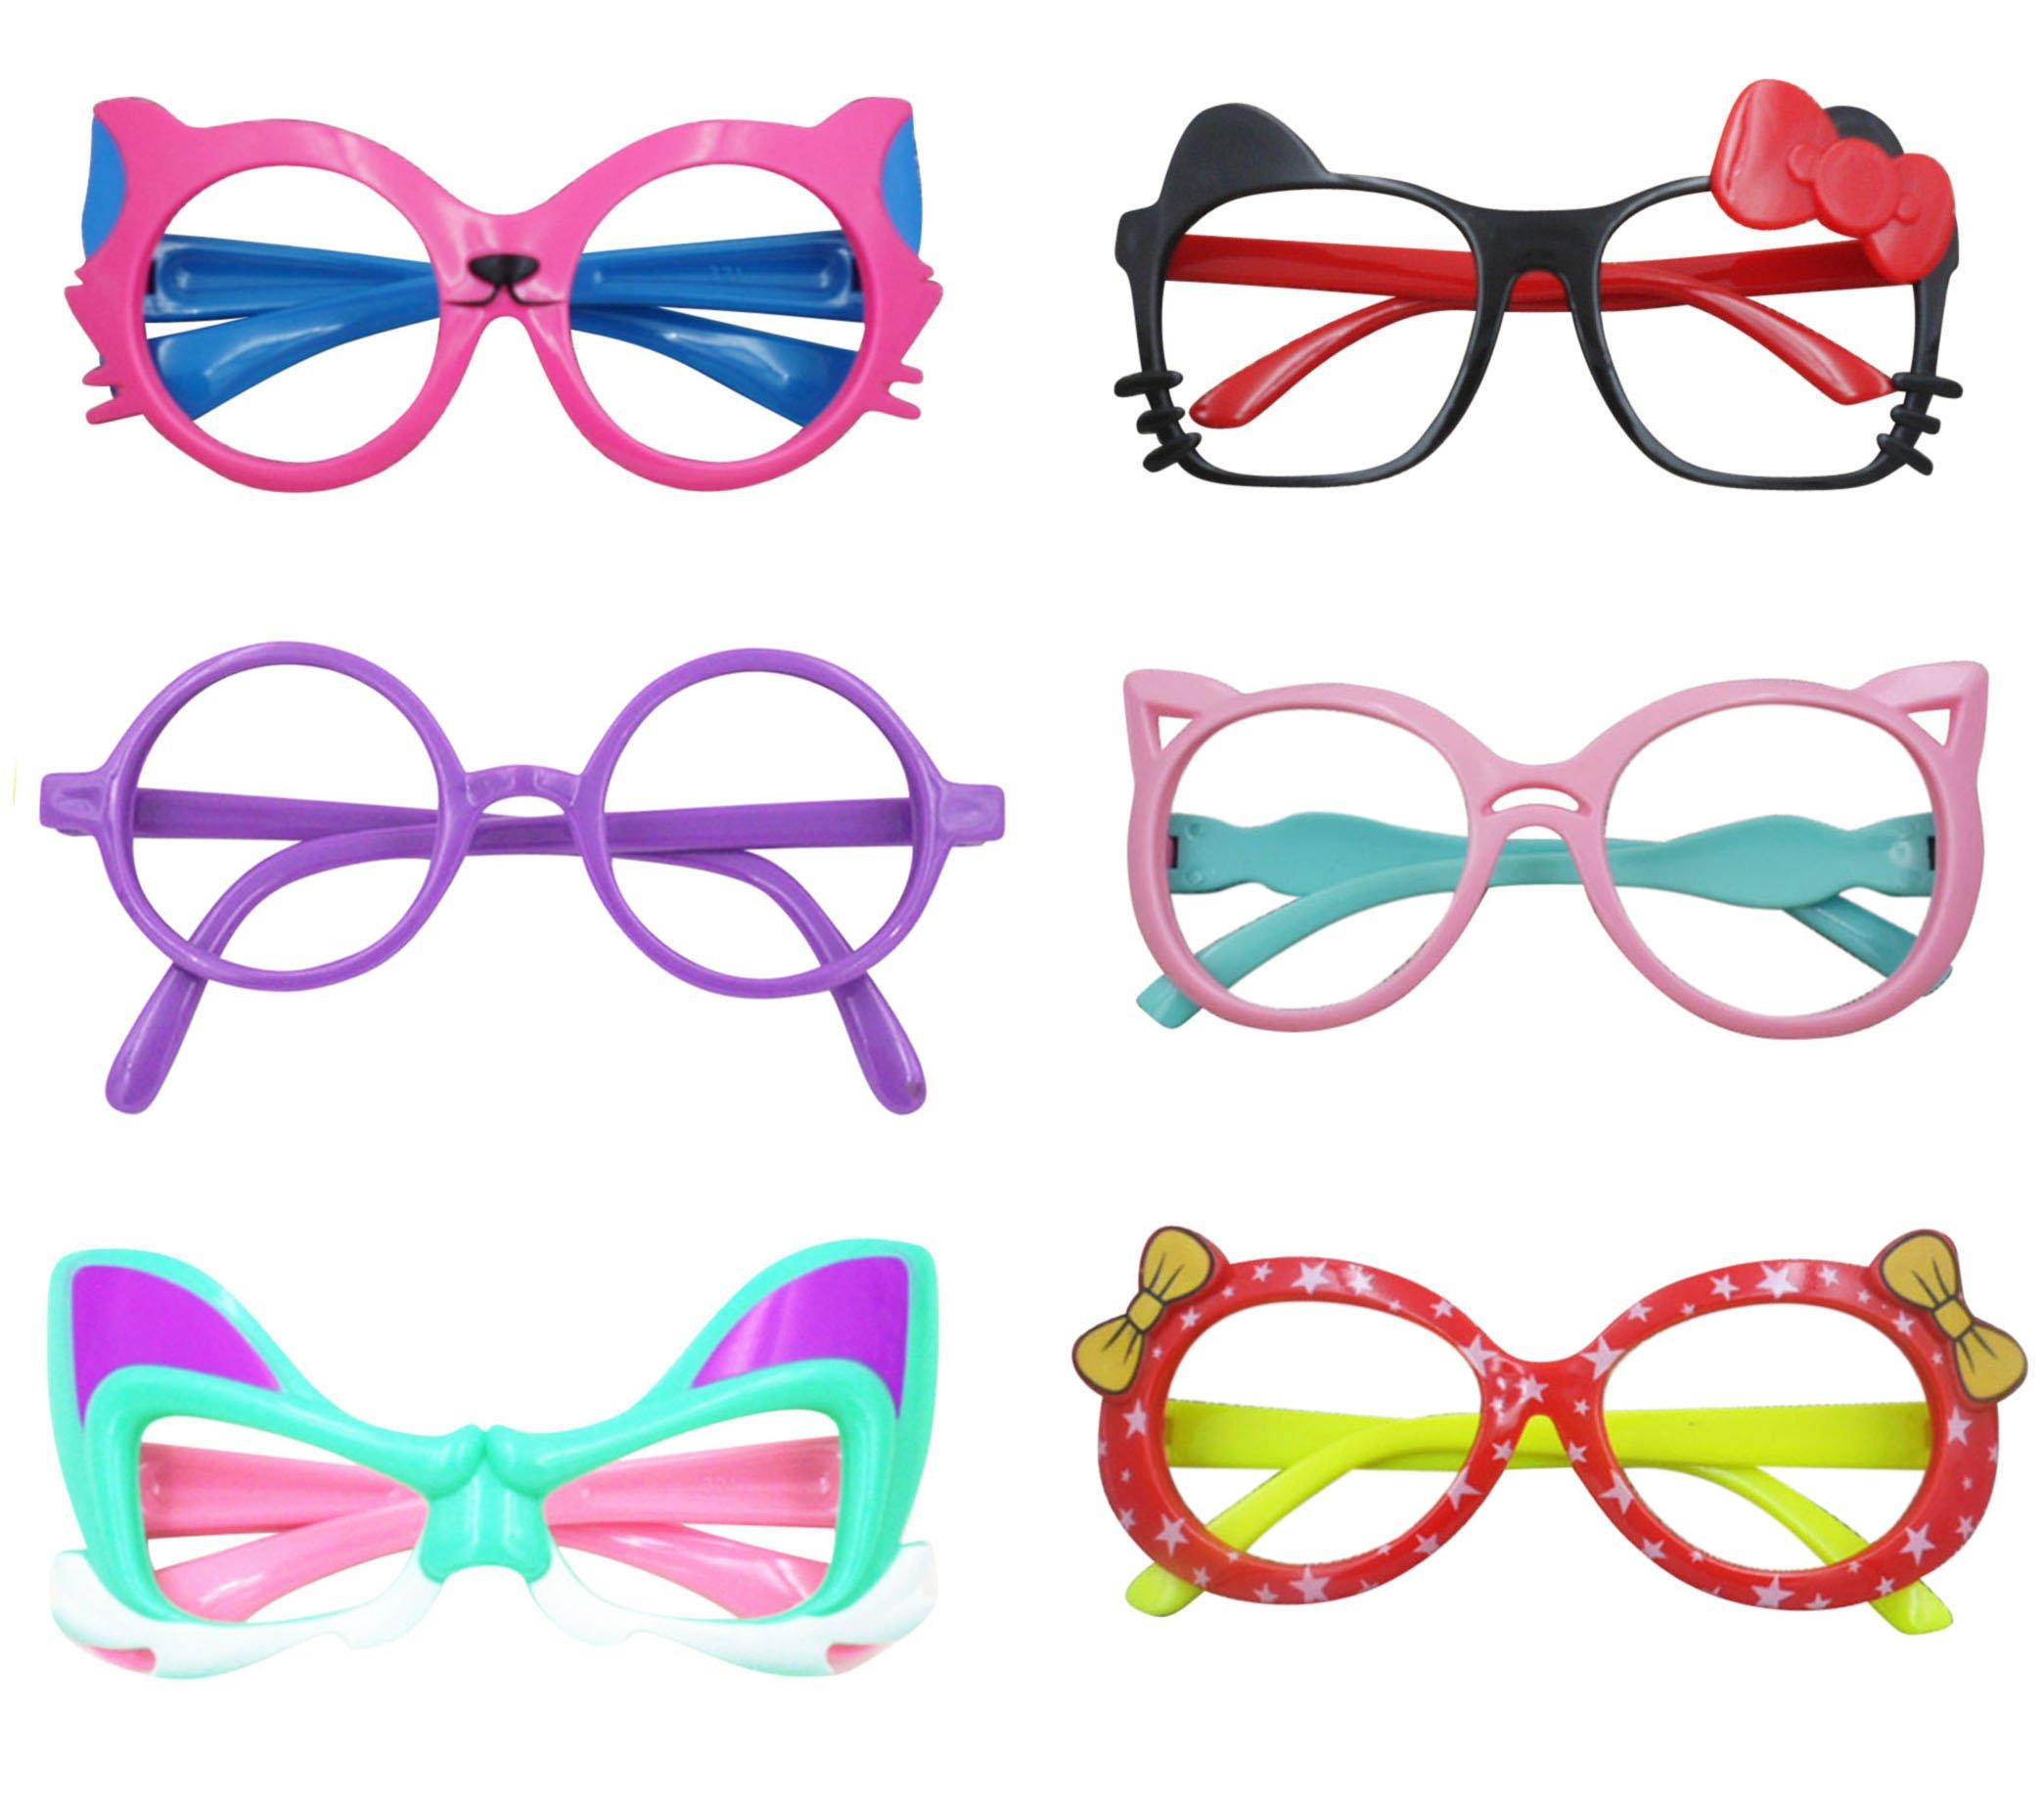 Eye Glasses for Children Kids Boys Girls Stylish Cute Frame Without Lenses, Pack of 6 (Combo #4)